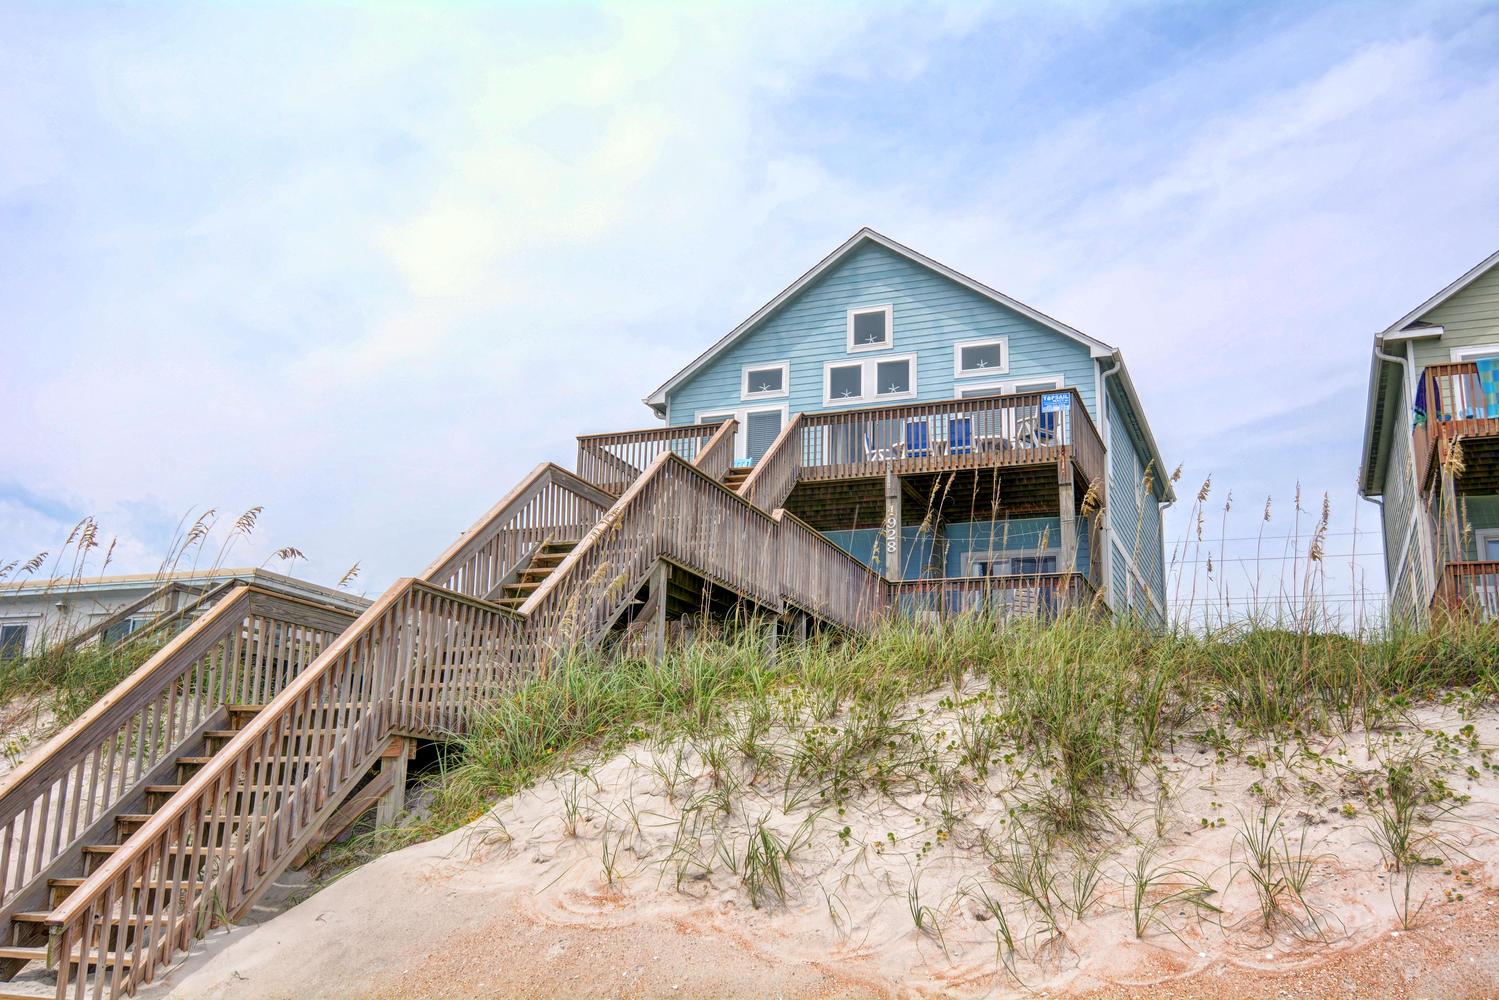 獨棟家庭住宅 為 出售 在 Oceanfront rental superstar 1928 South Shore Drive Surf City, 北卡羅來納州 28445 美國